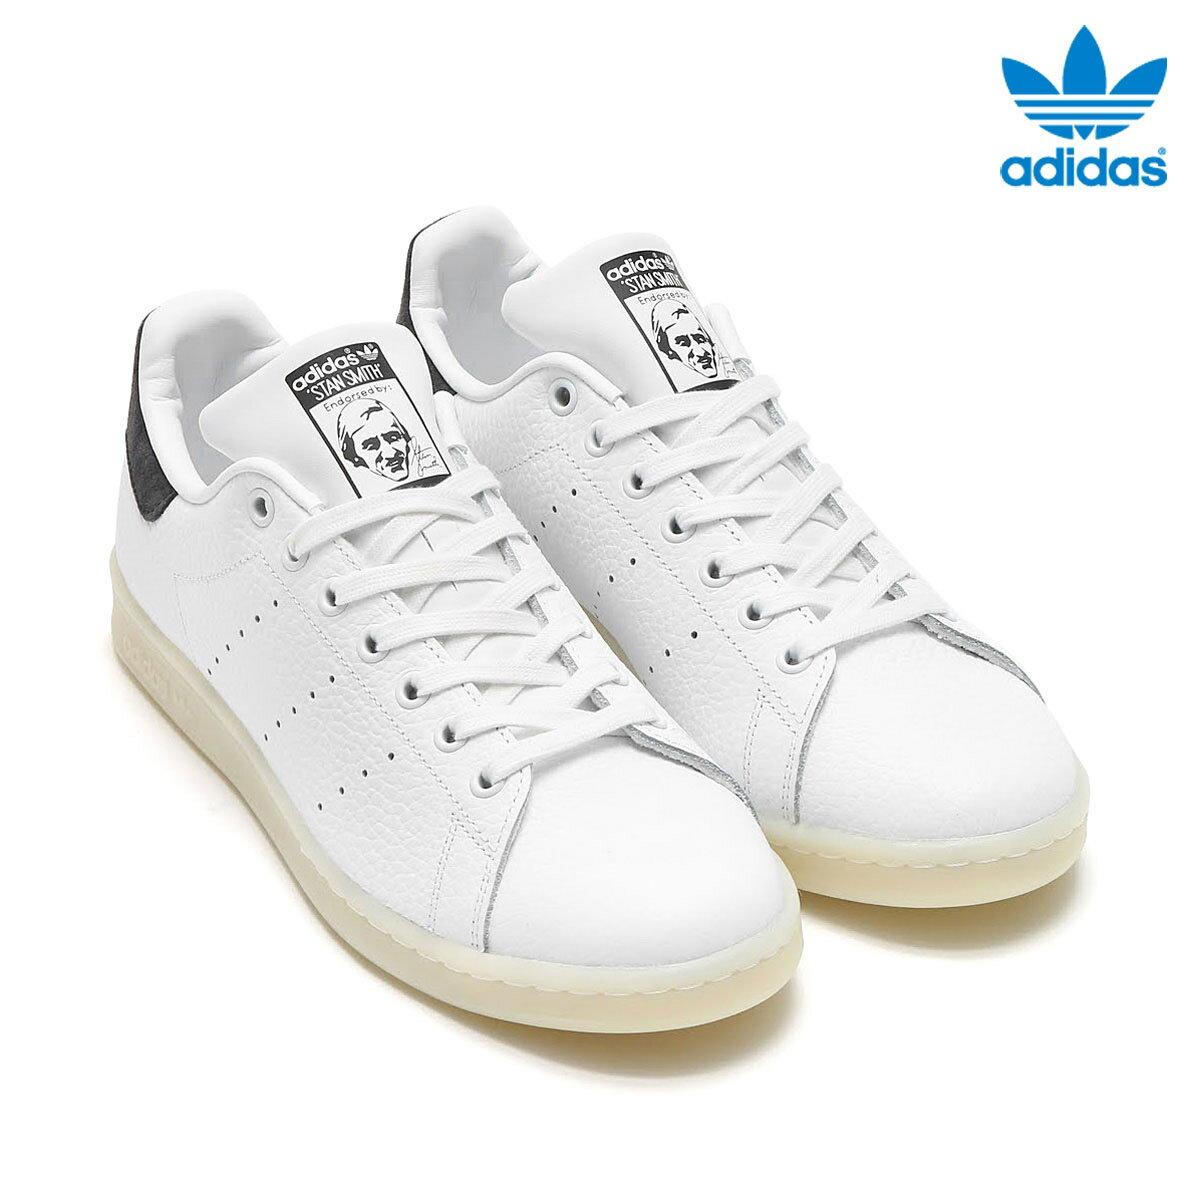 adidas Originals STAN SMITH (アディダス オリジナルス スタンスミス) RUNNING WHITE/RUNNING WHITE/UTILITY BLACK【メンズ レディース スニーカー】17SS-I